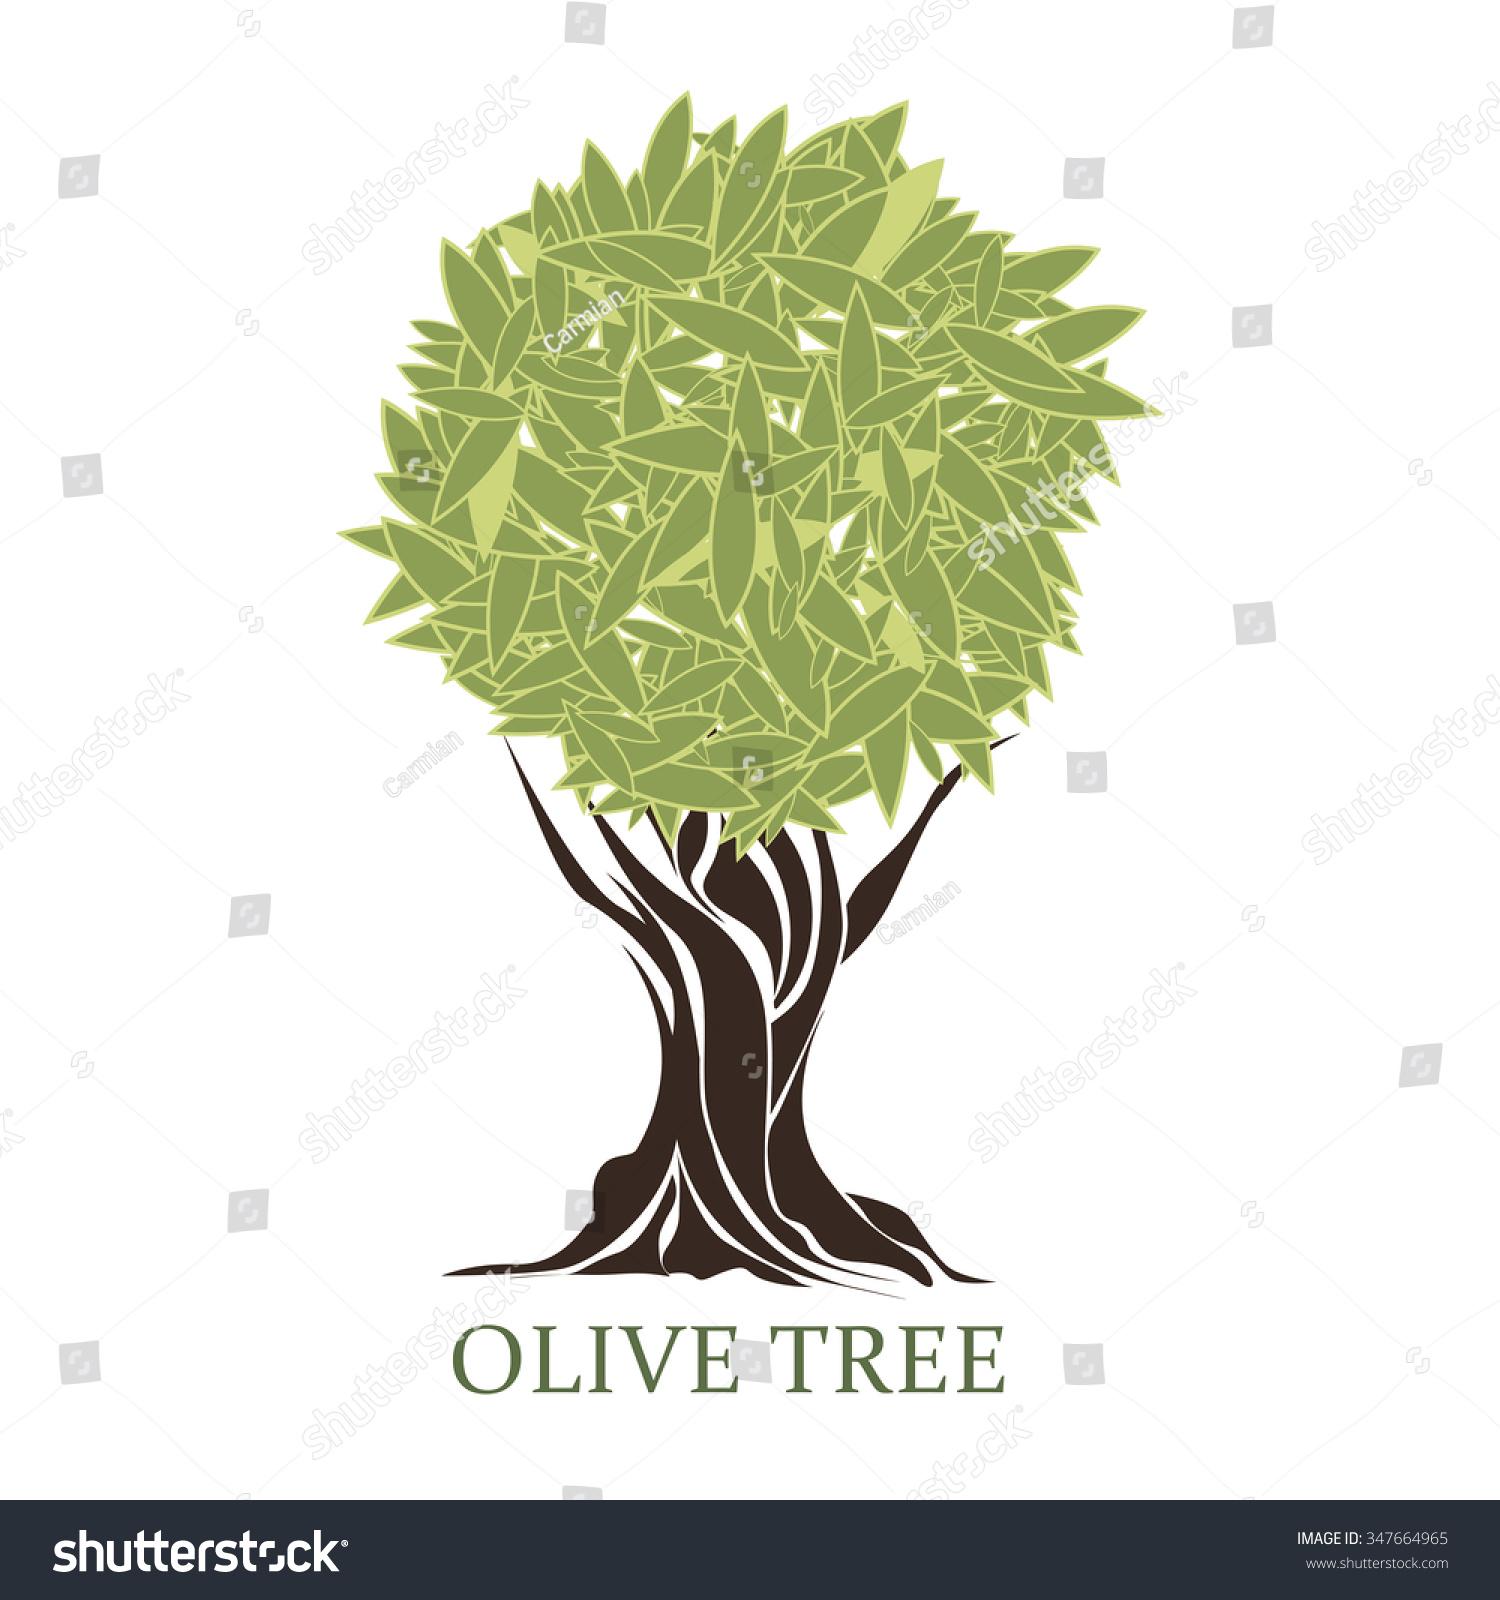 Logo Form Stylized Olive Tree Stock Vector 347664965 - Shutterstock